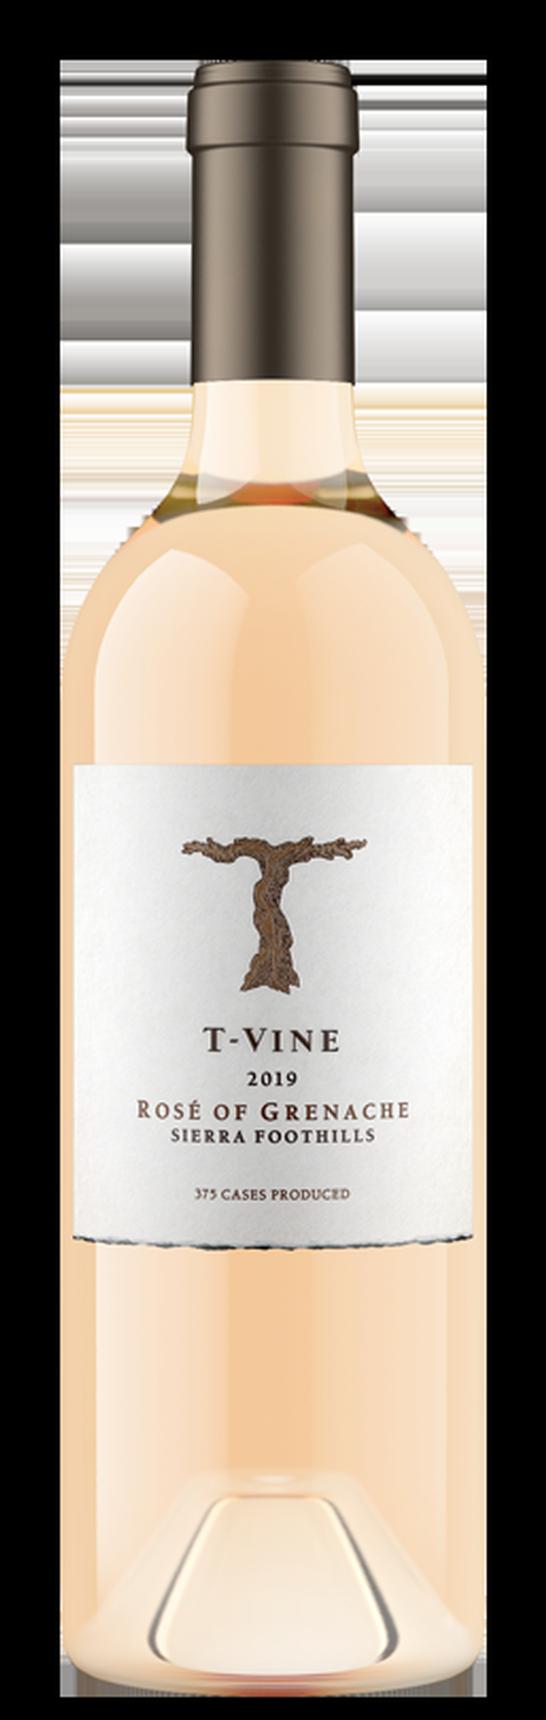 2019 Rosé of Grenache